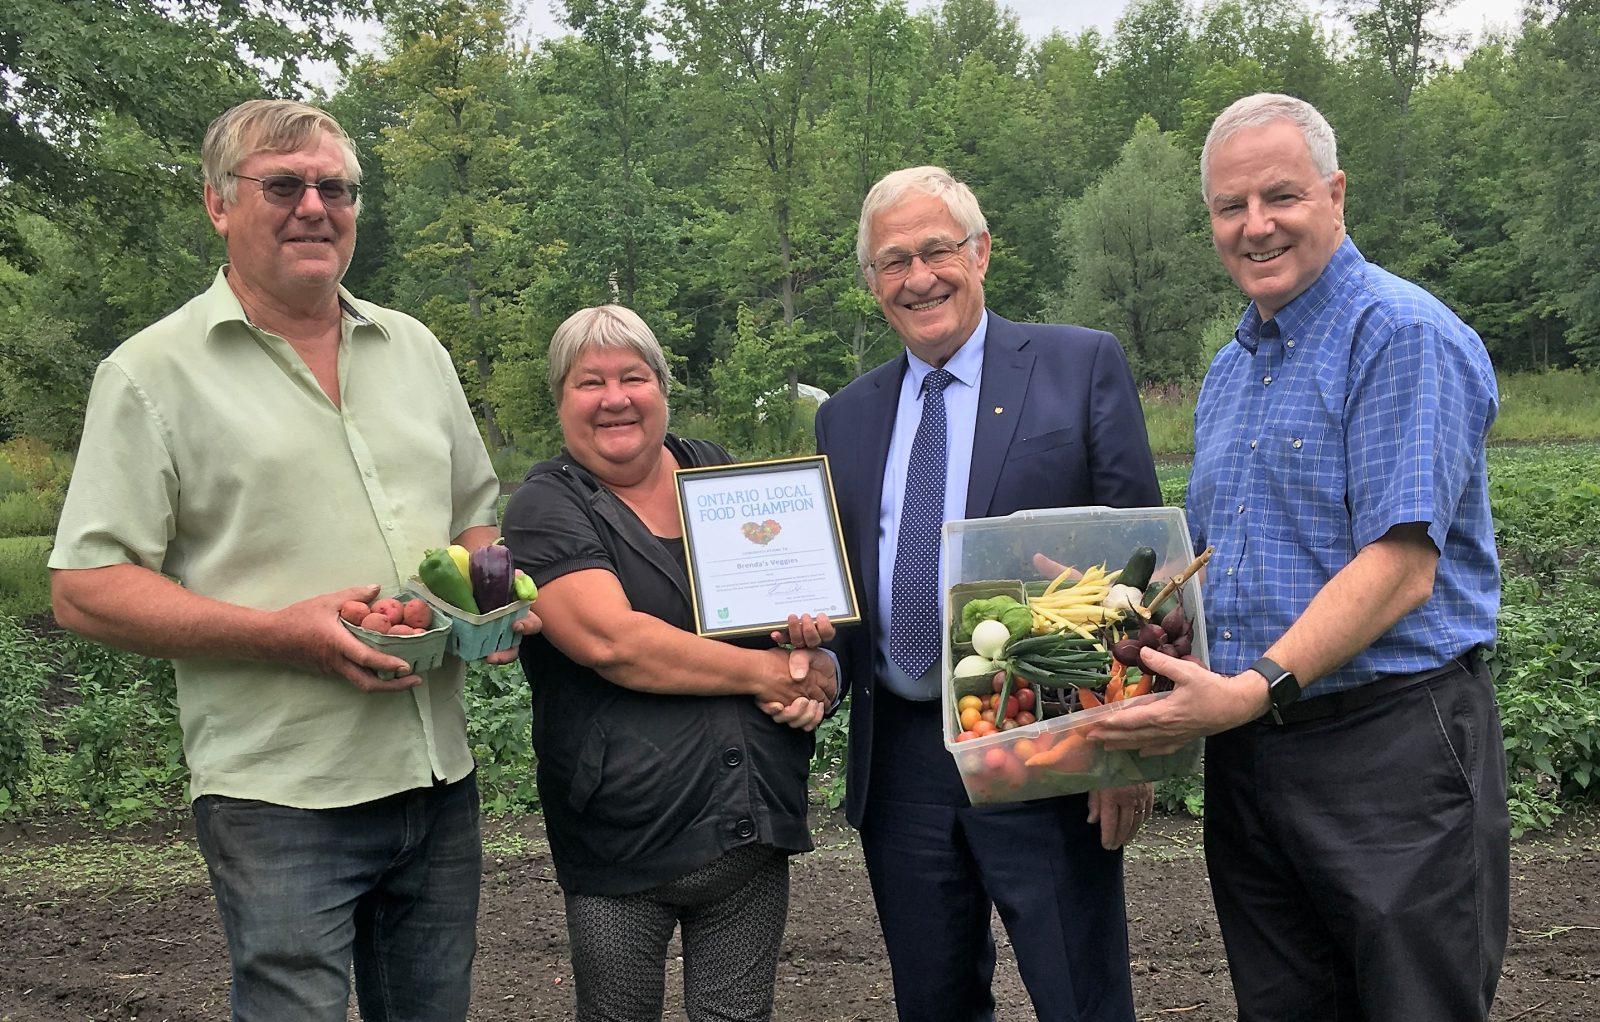 Brenda's Veggies recognized as provincial Food Champion